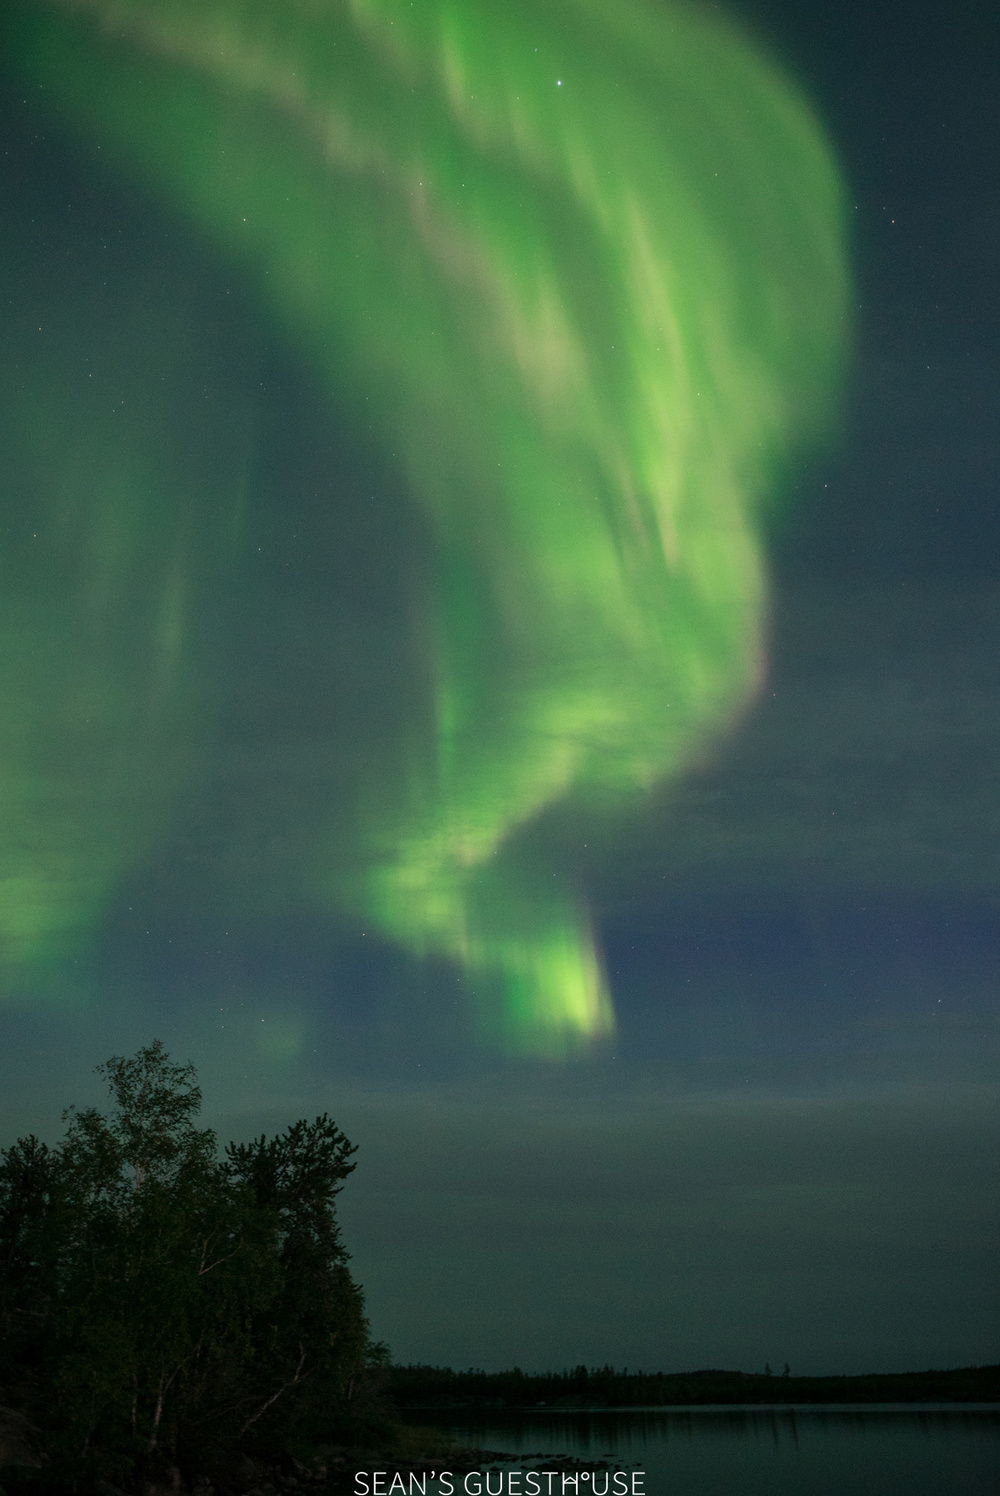 Sean's Guesthouse - Yellowknife Northern Lights Autumn - 6.jpg